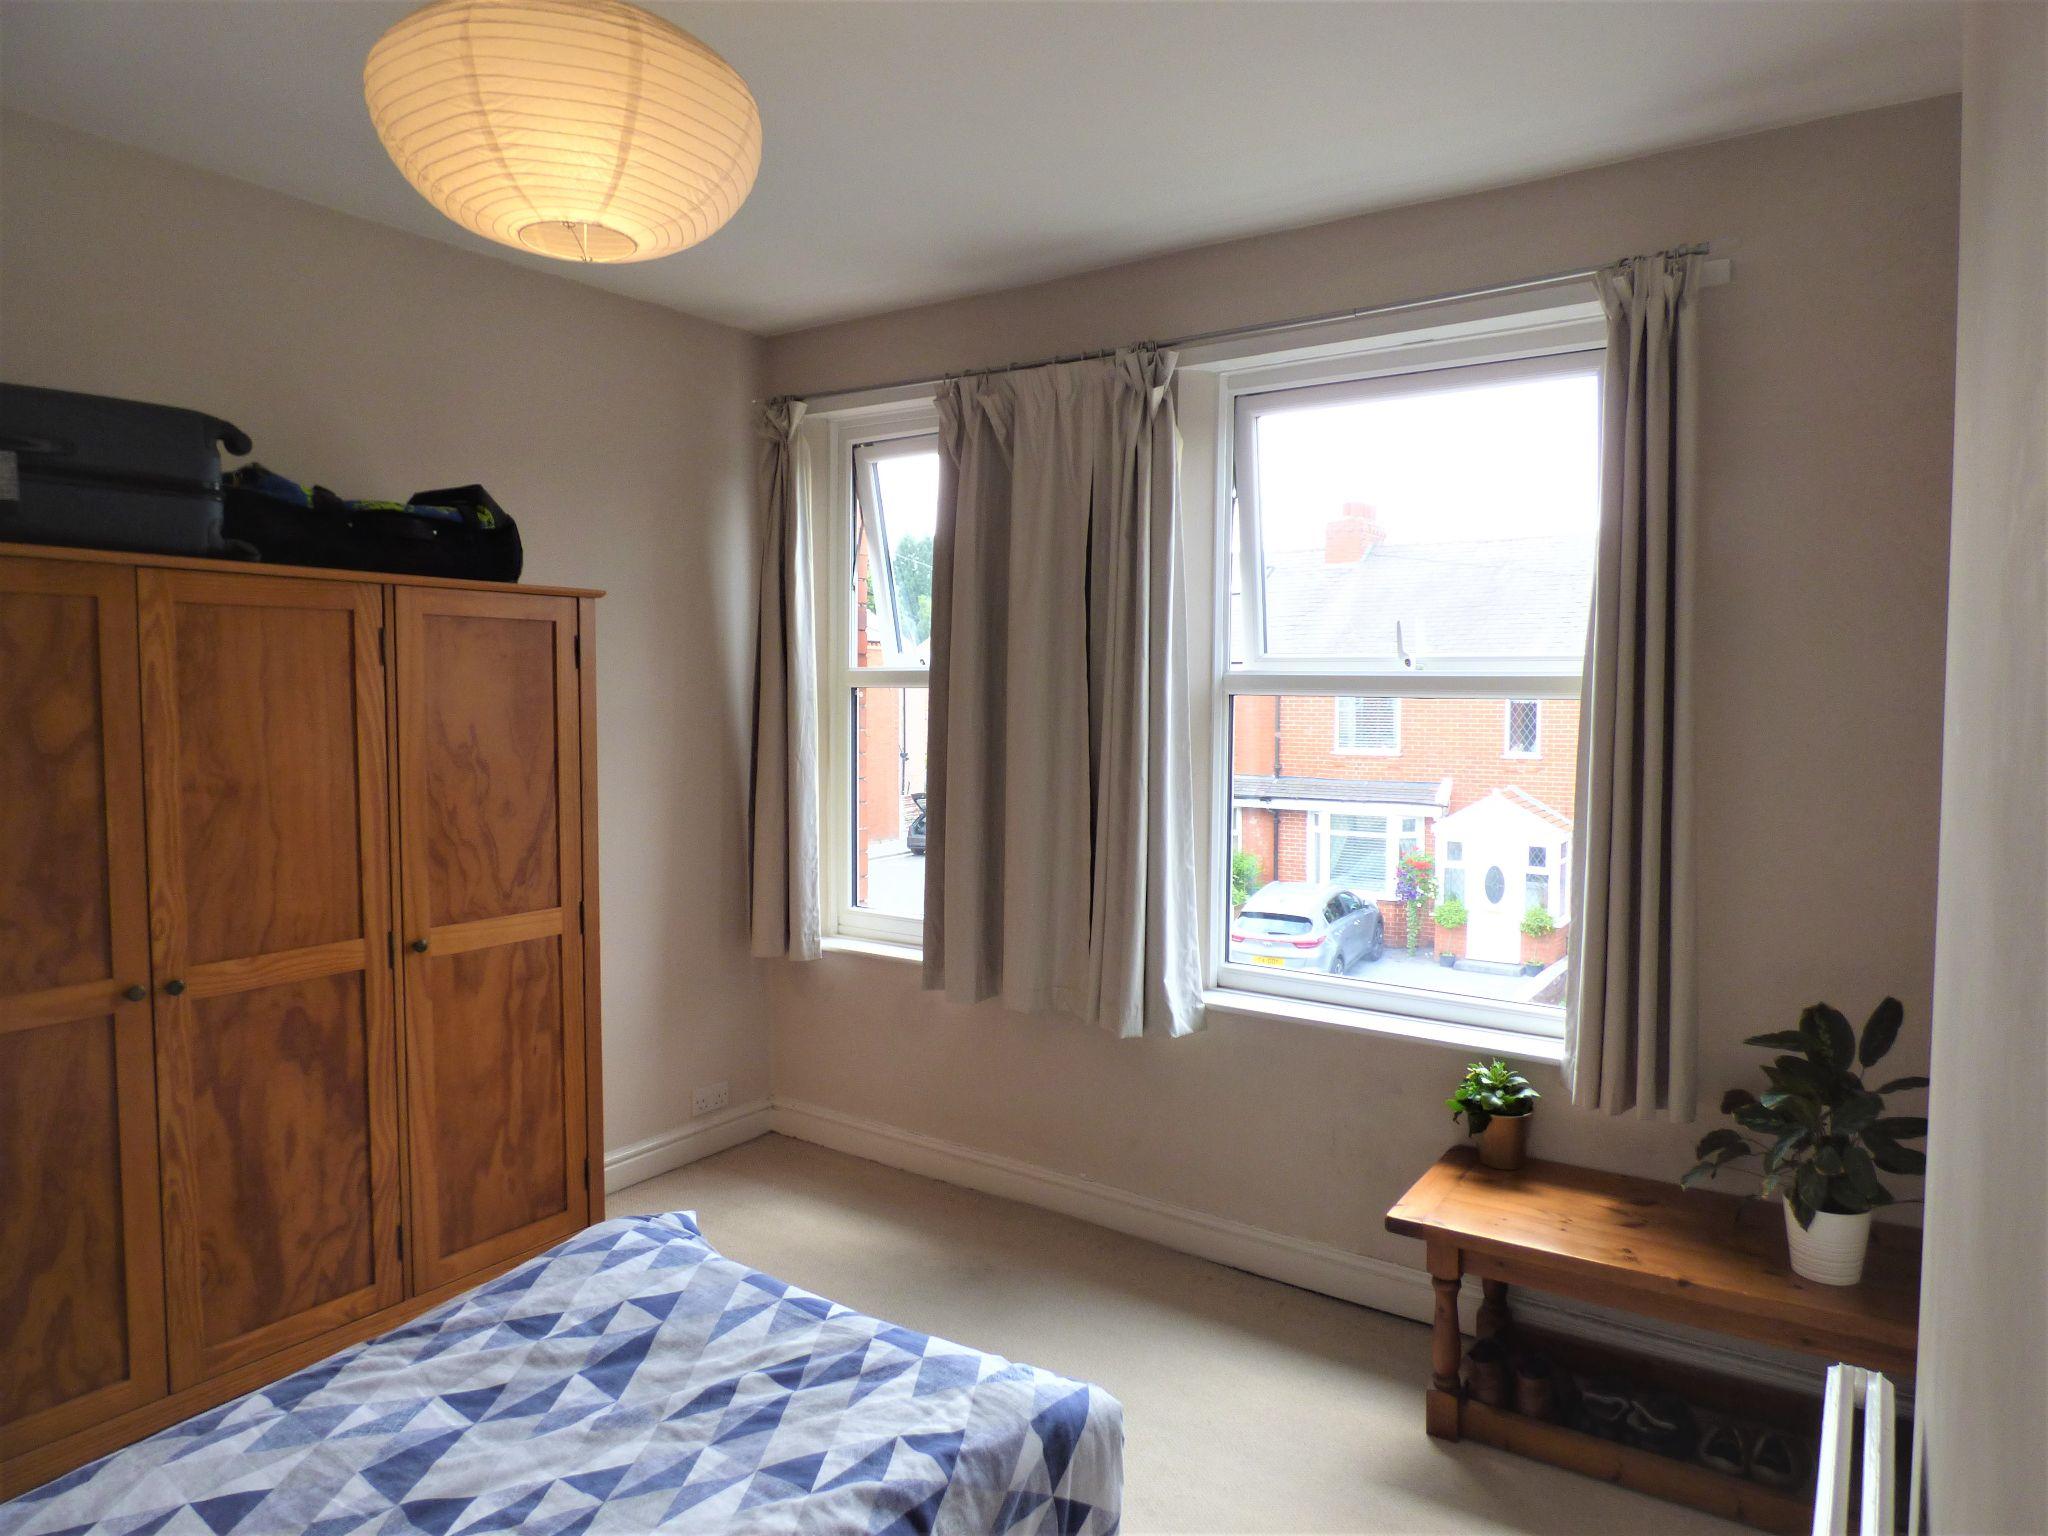 2 Bedroom Semi-detached House For Sale - Bedroom One